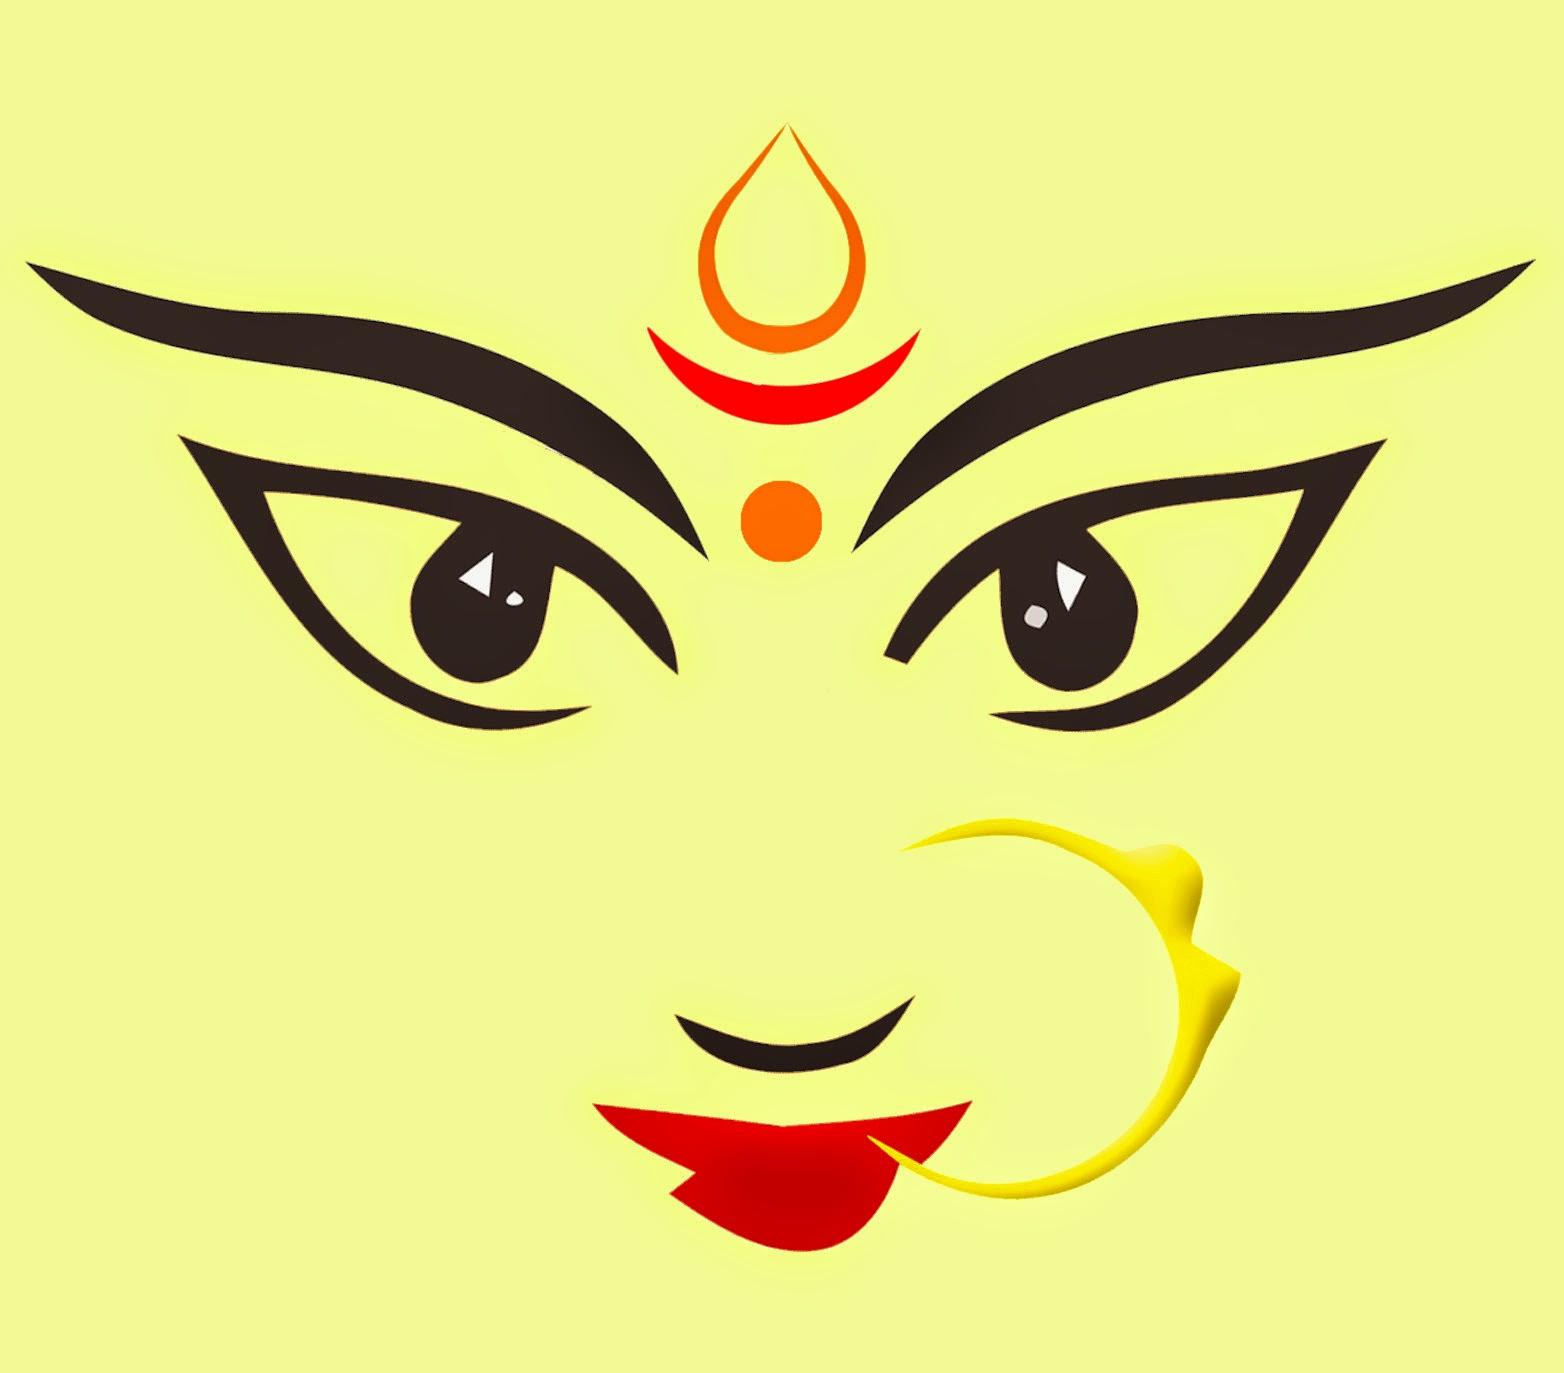 Goddess clipart dhaki And 05 Assam: 2011 Durga